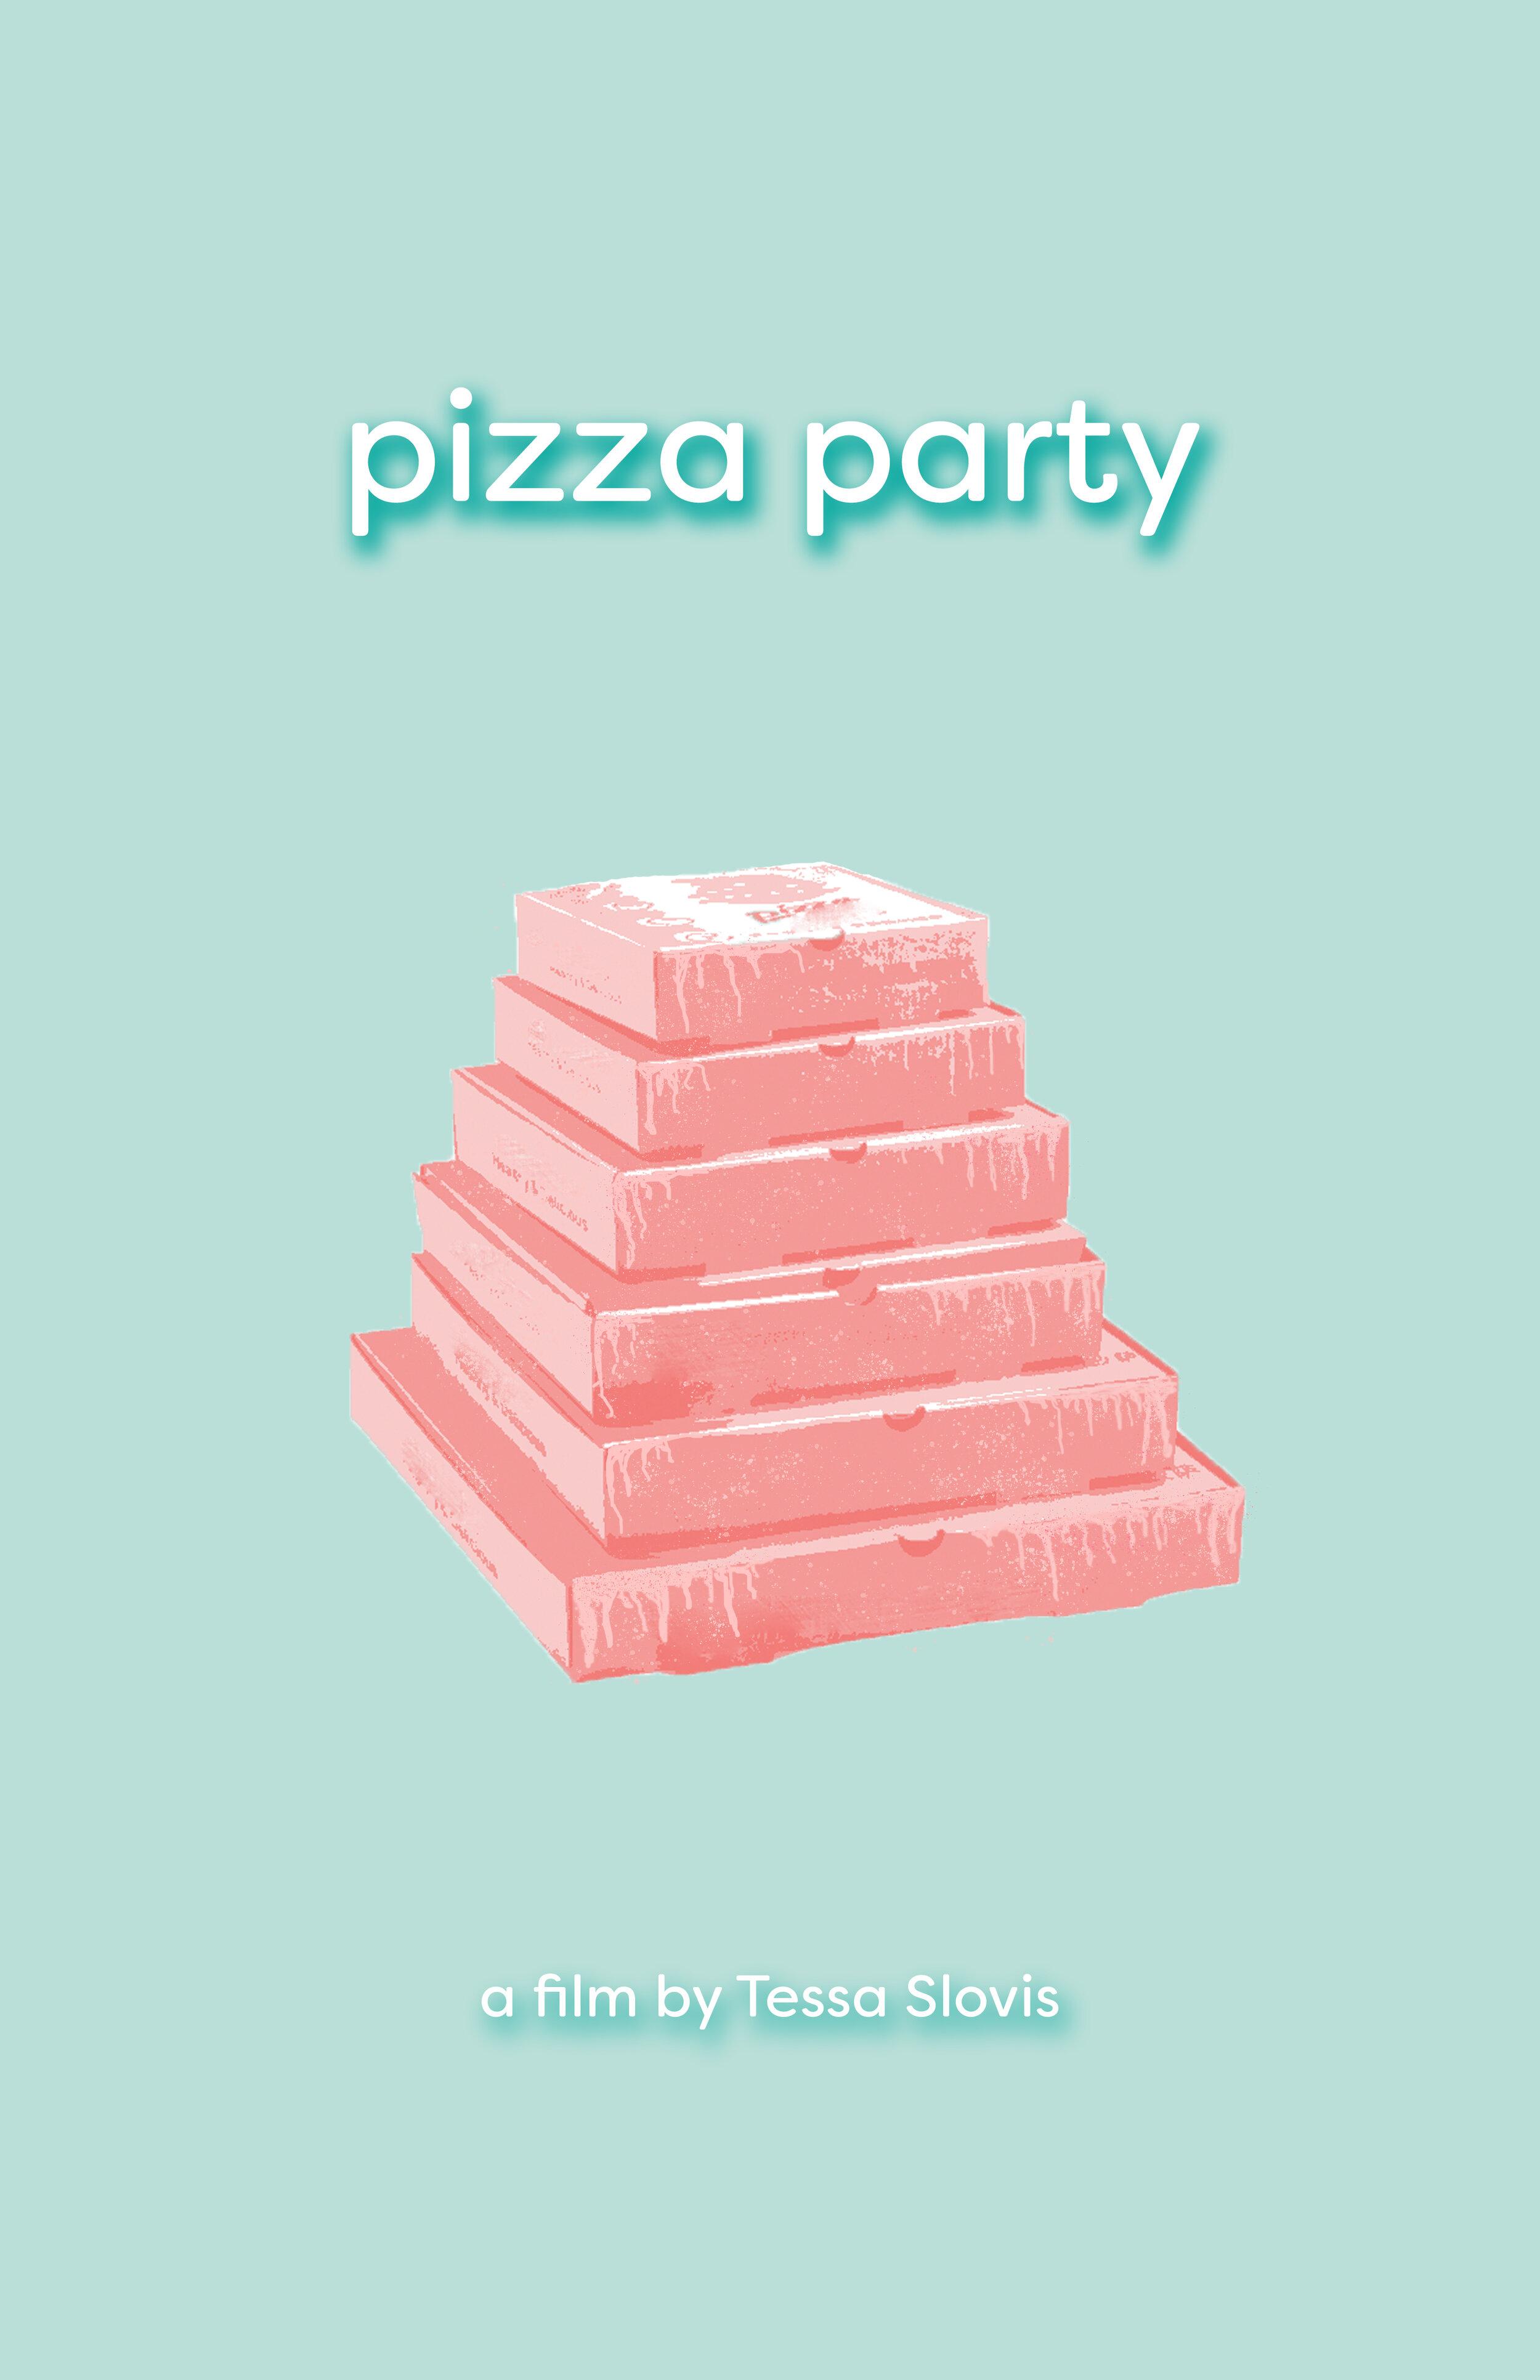 pizza party v6.2.jpg